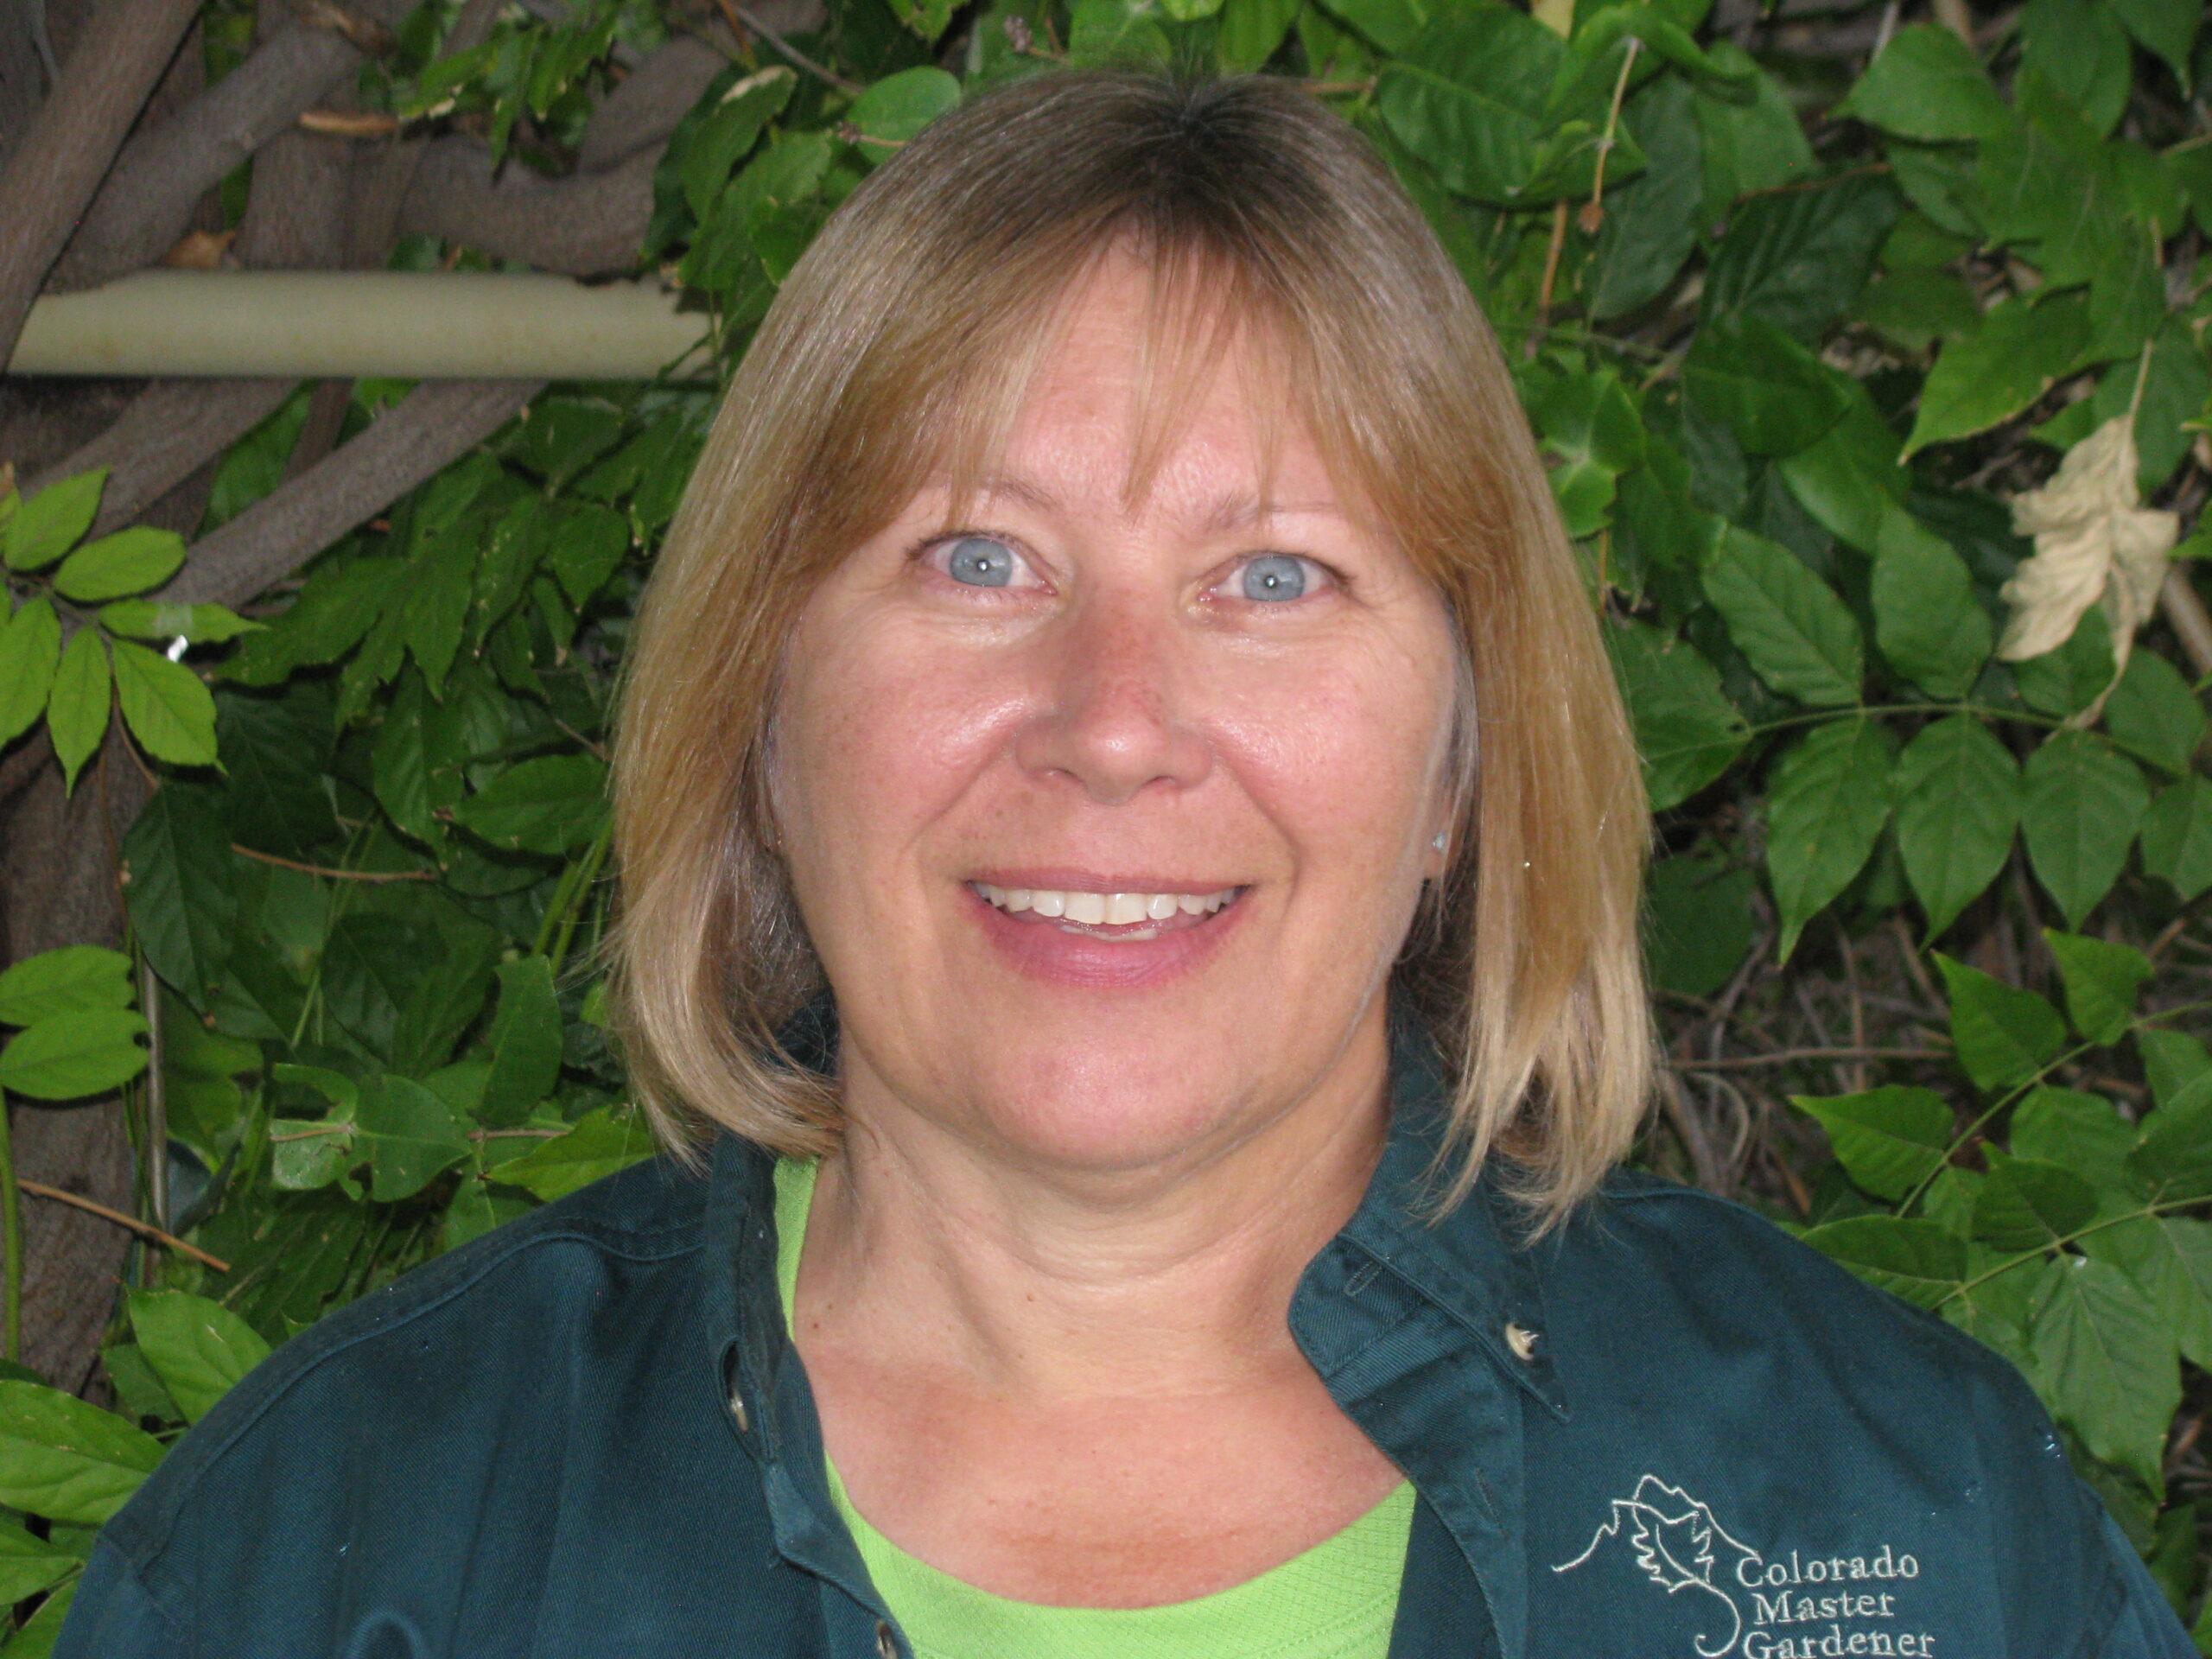 Profile image of Susan Carter